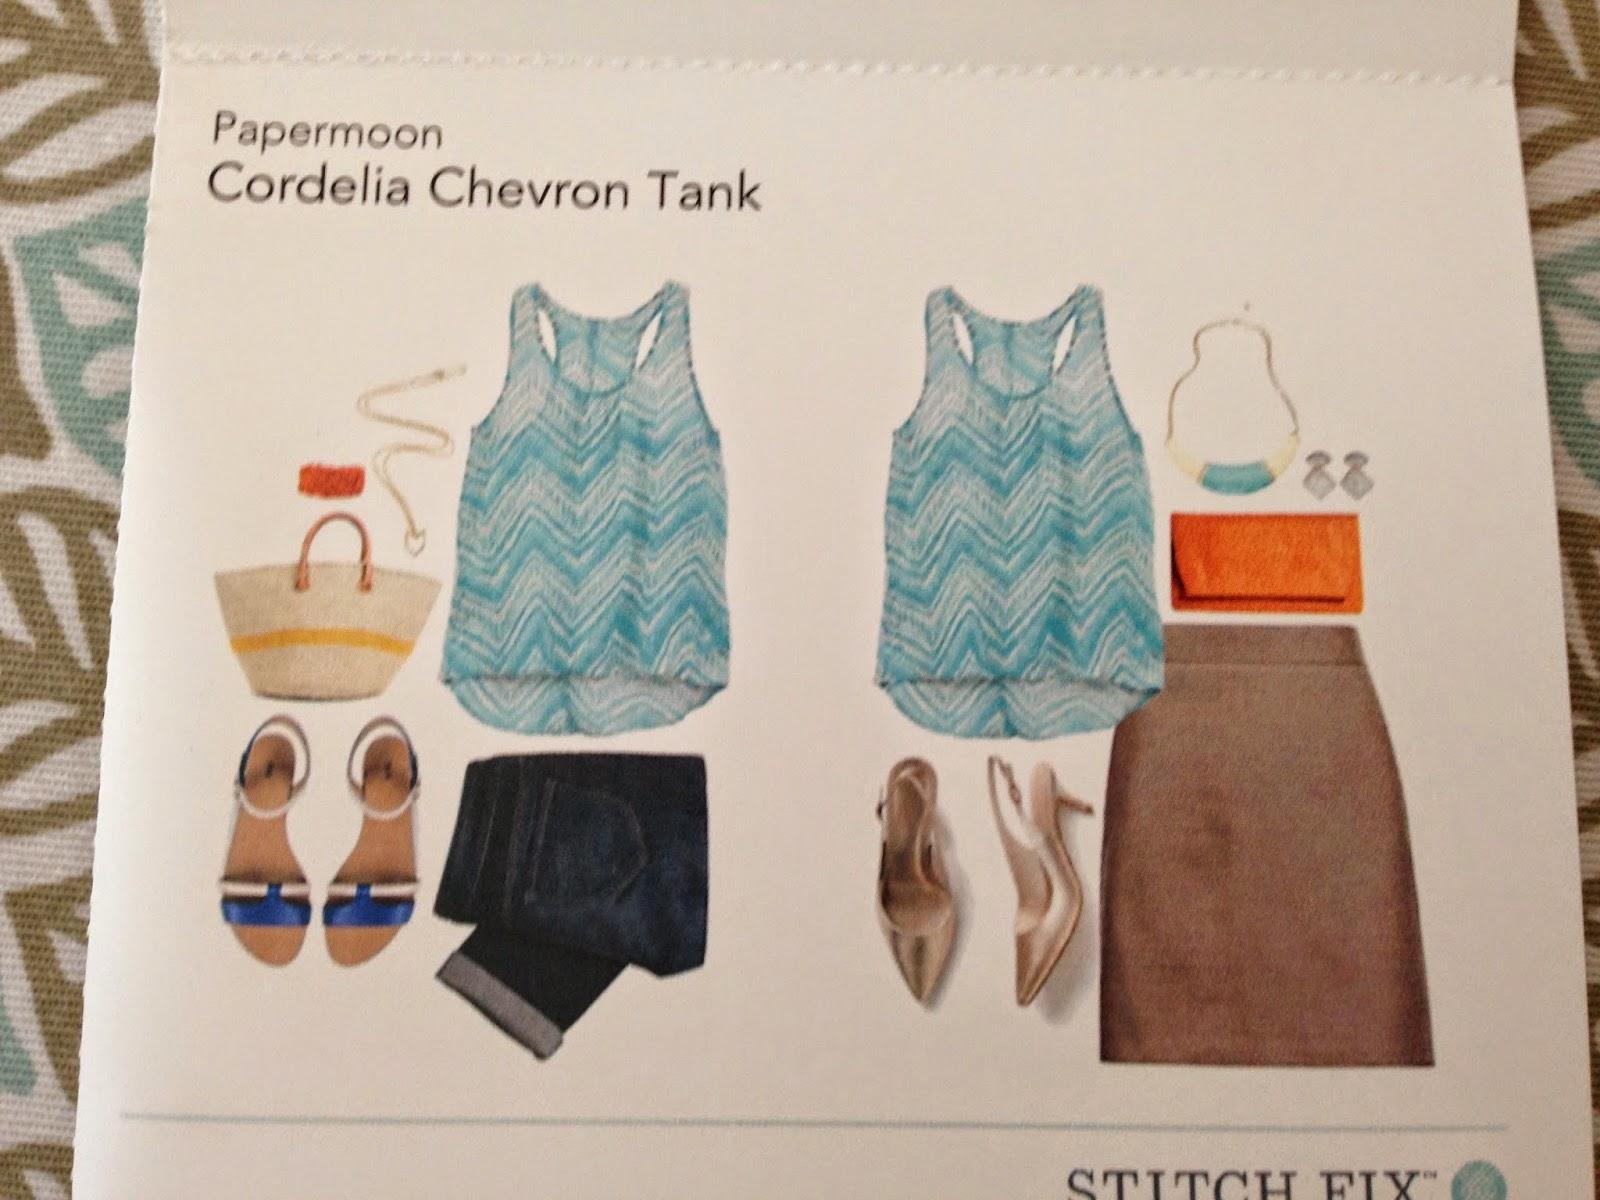 Stitchfix, Cordelia Chevron Tan